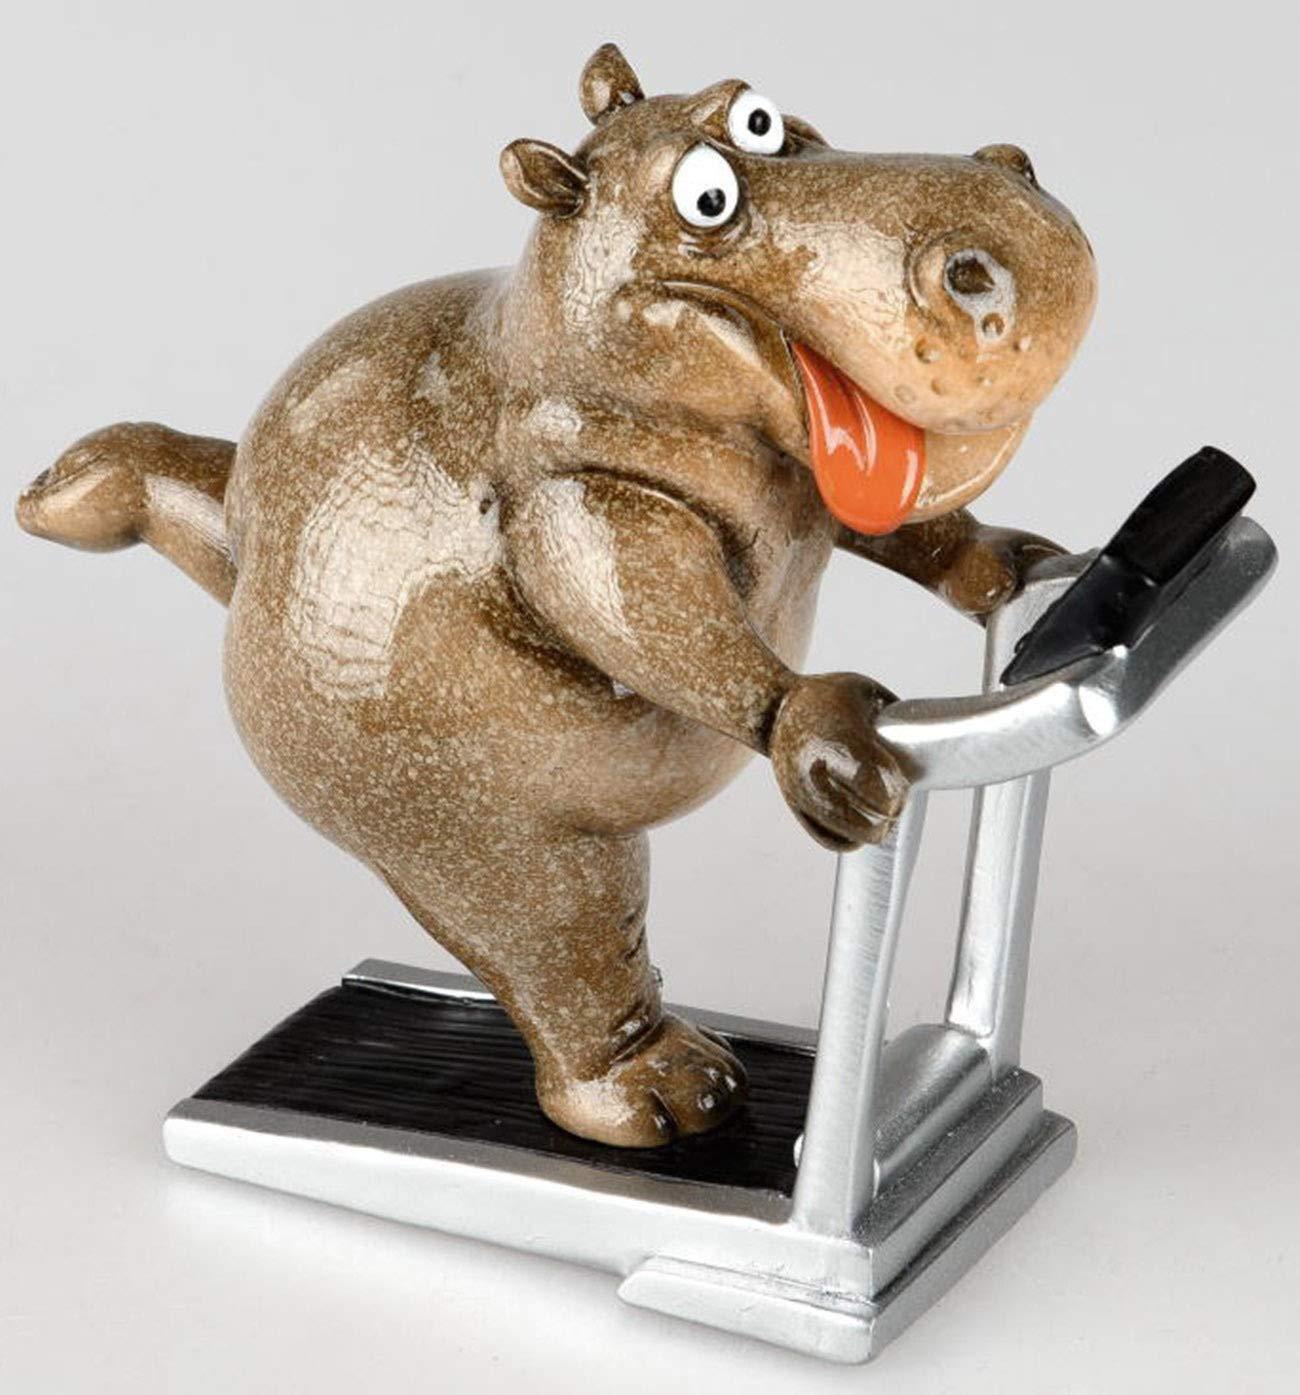 dekojohnson - Figura Decorativa Divertida de hipopótamo (18 x 16 x ...